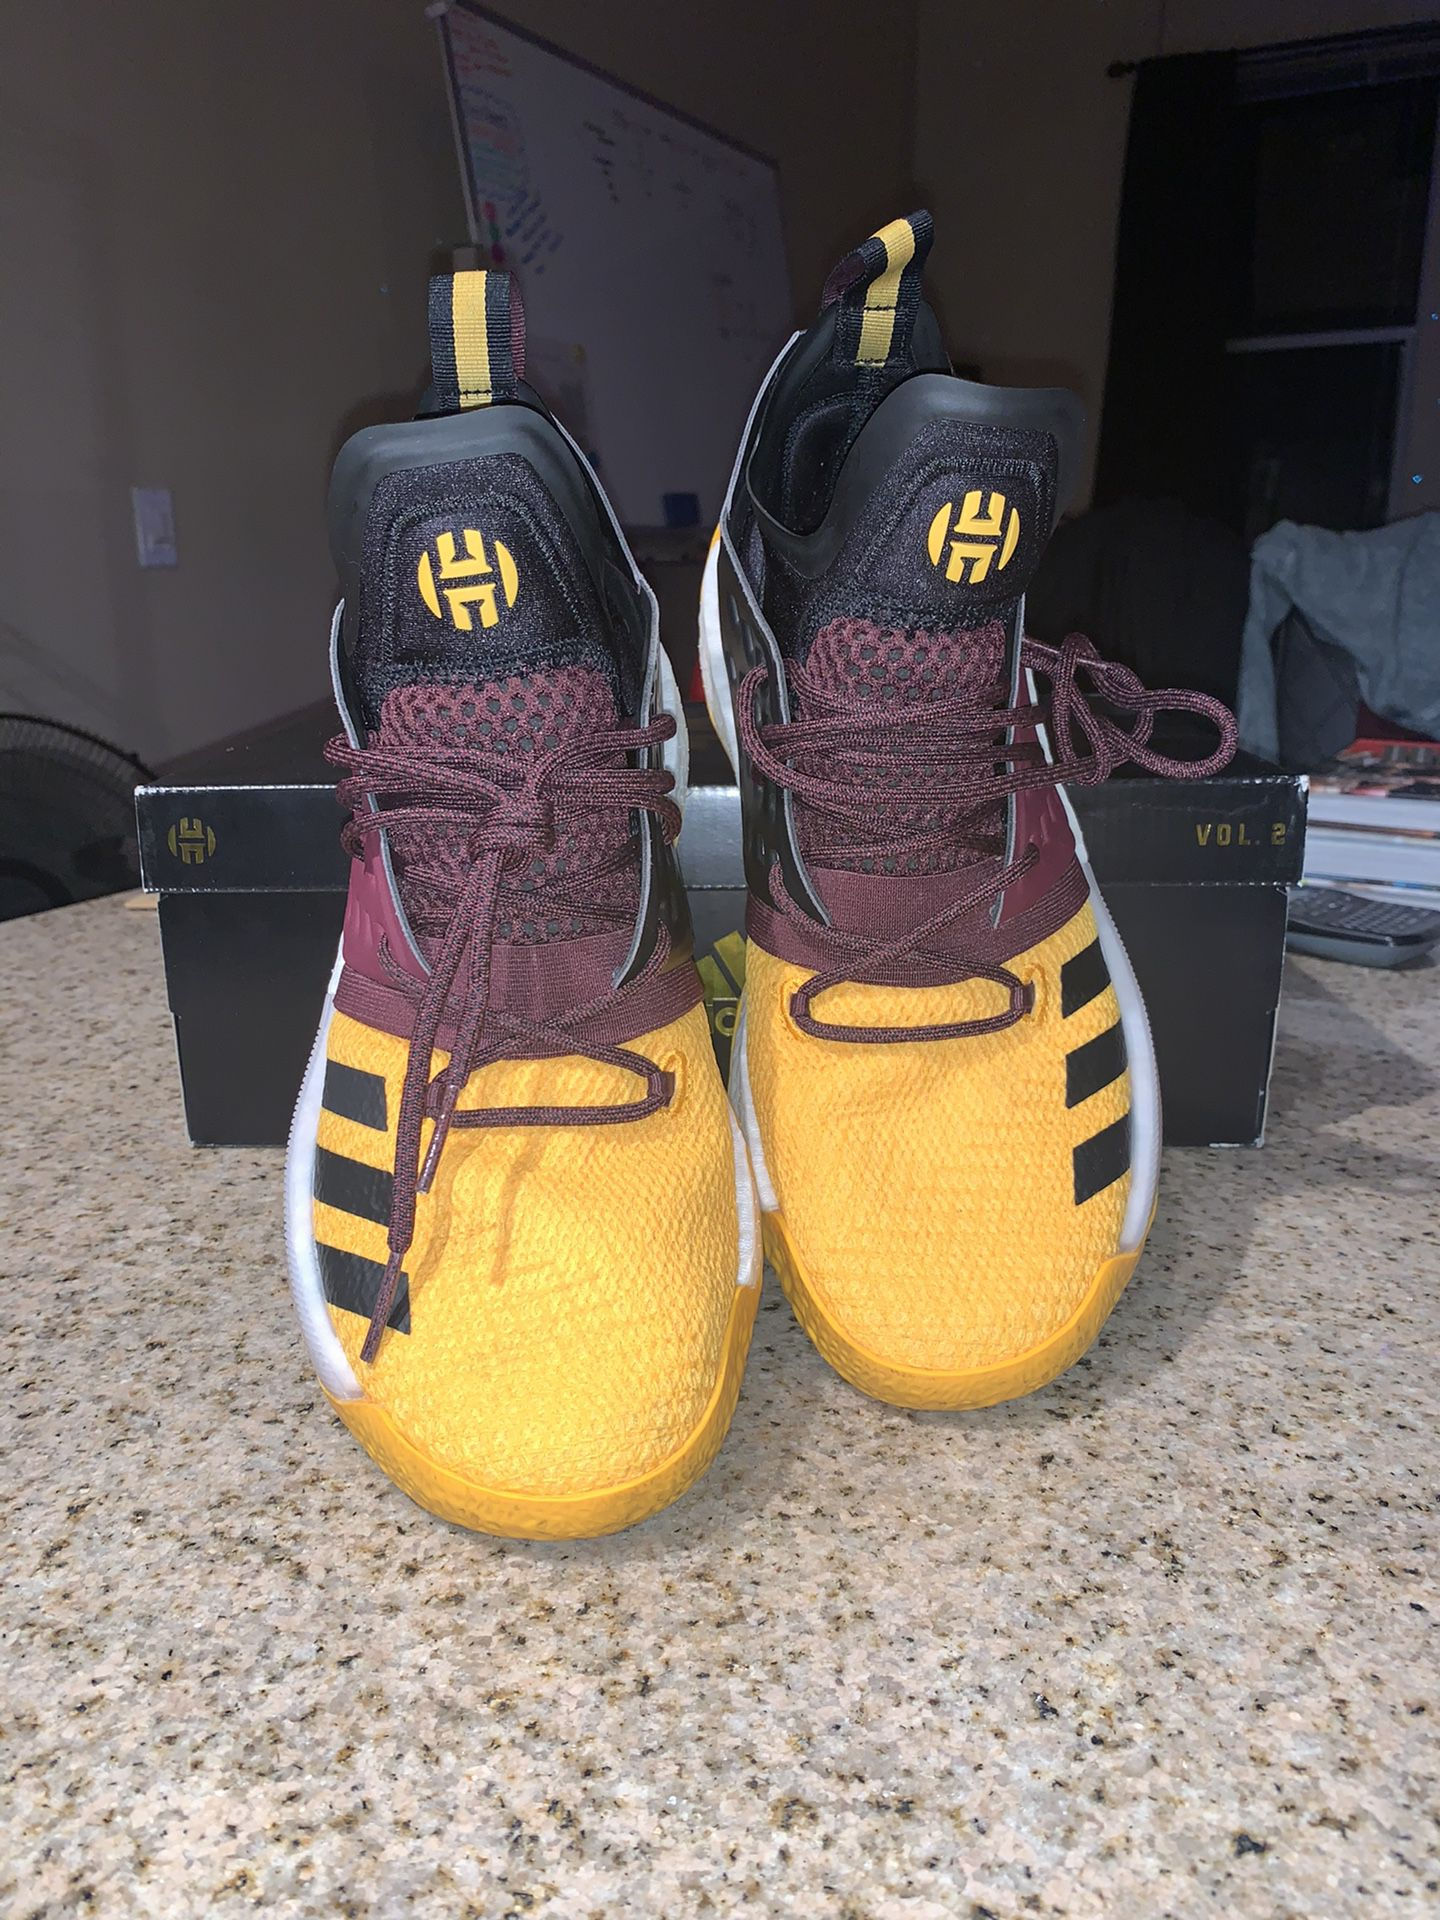 adidas Harden Vol. 2 Arizona State University Sz. 9.5M